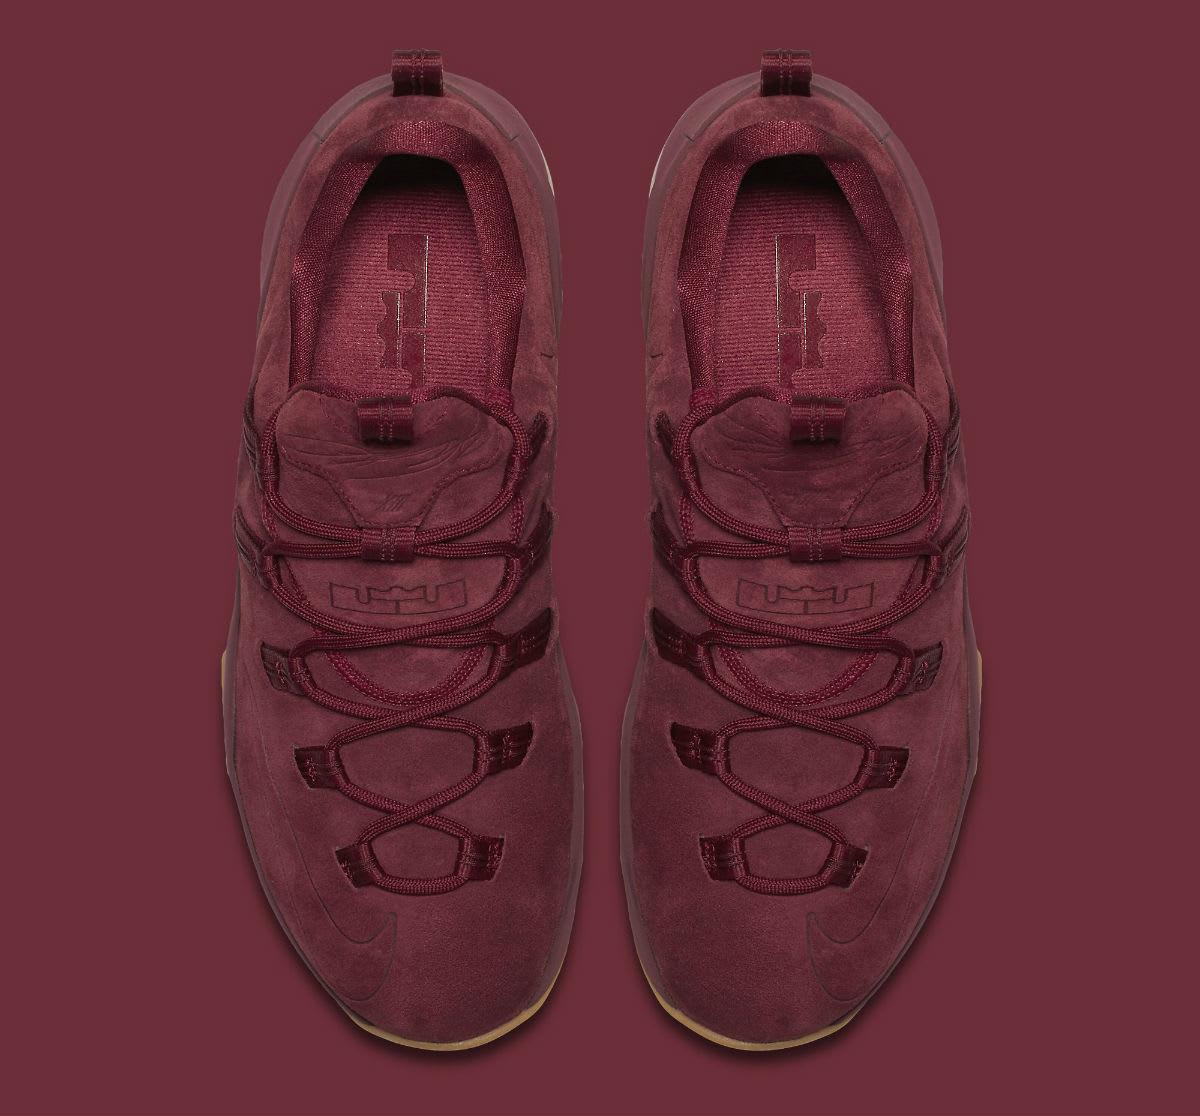 size 40 9c613 14e33 ... Nike LeBron 13 Low Premium Team Red Release Date Top AH8289-600 ... cheap  nike lebron 14 black white brown ...